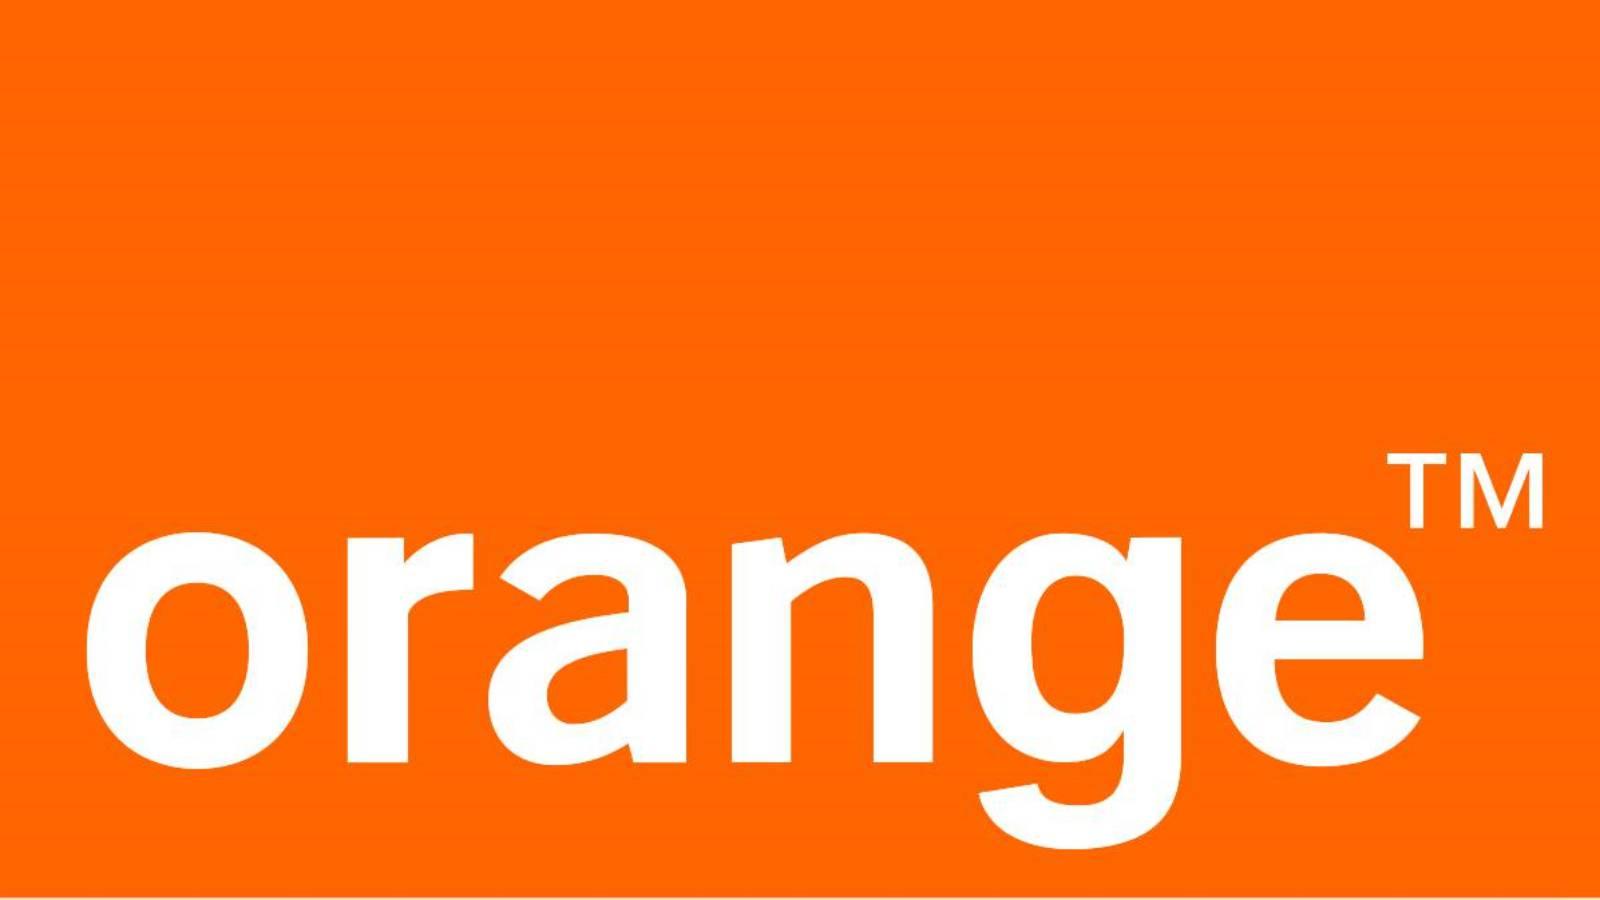 Hotararea Orange SCHIMBARE Clienti